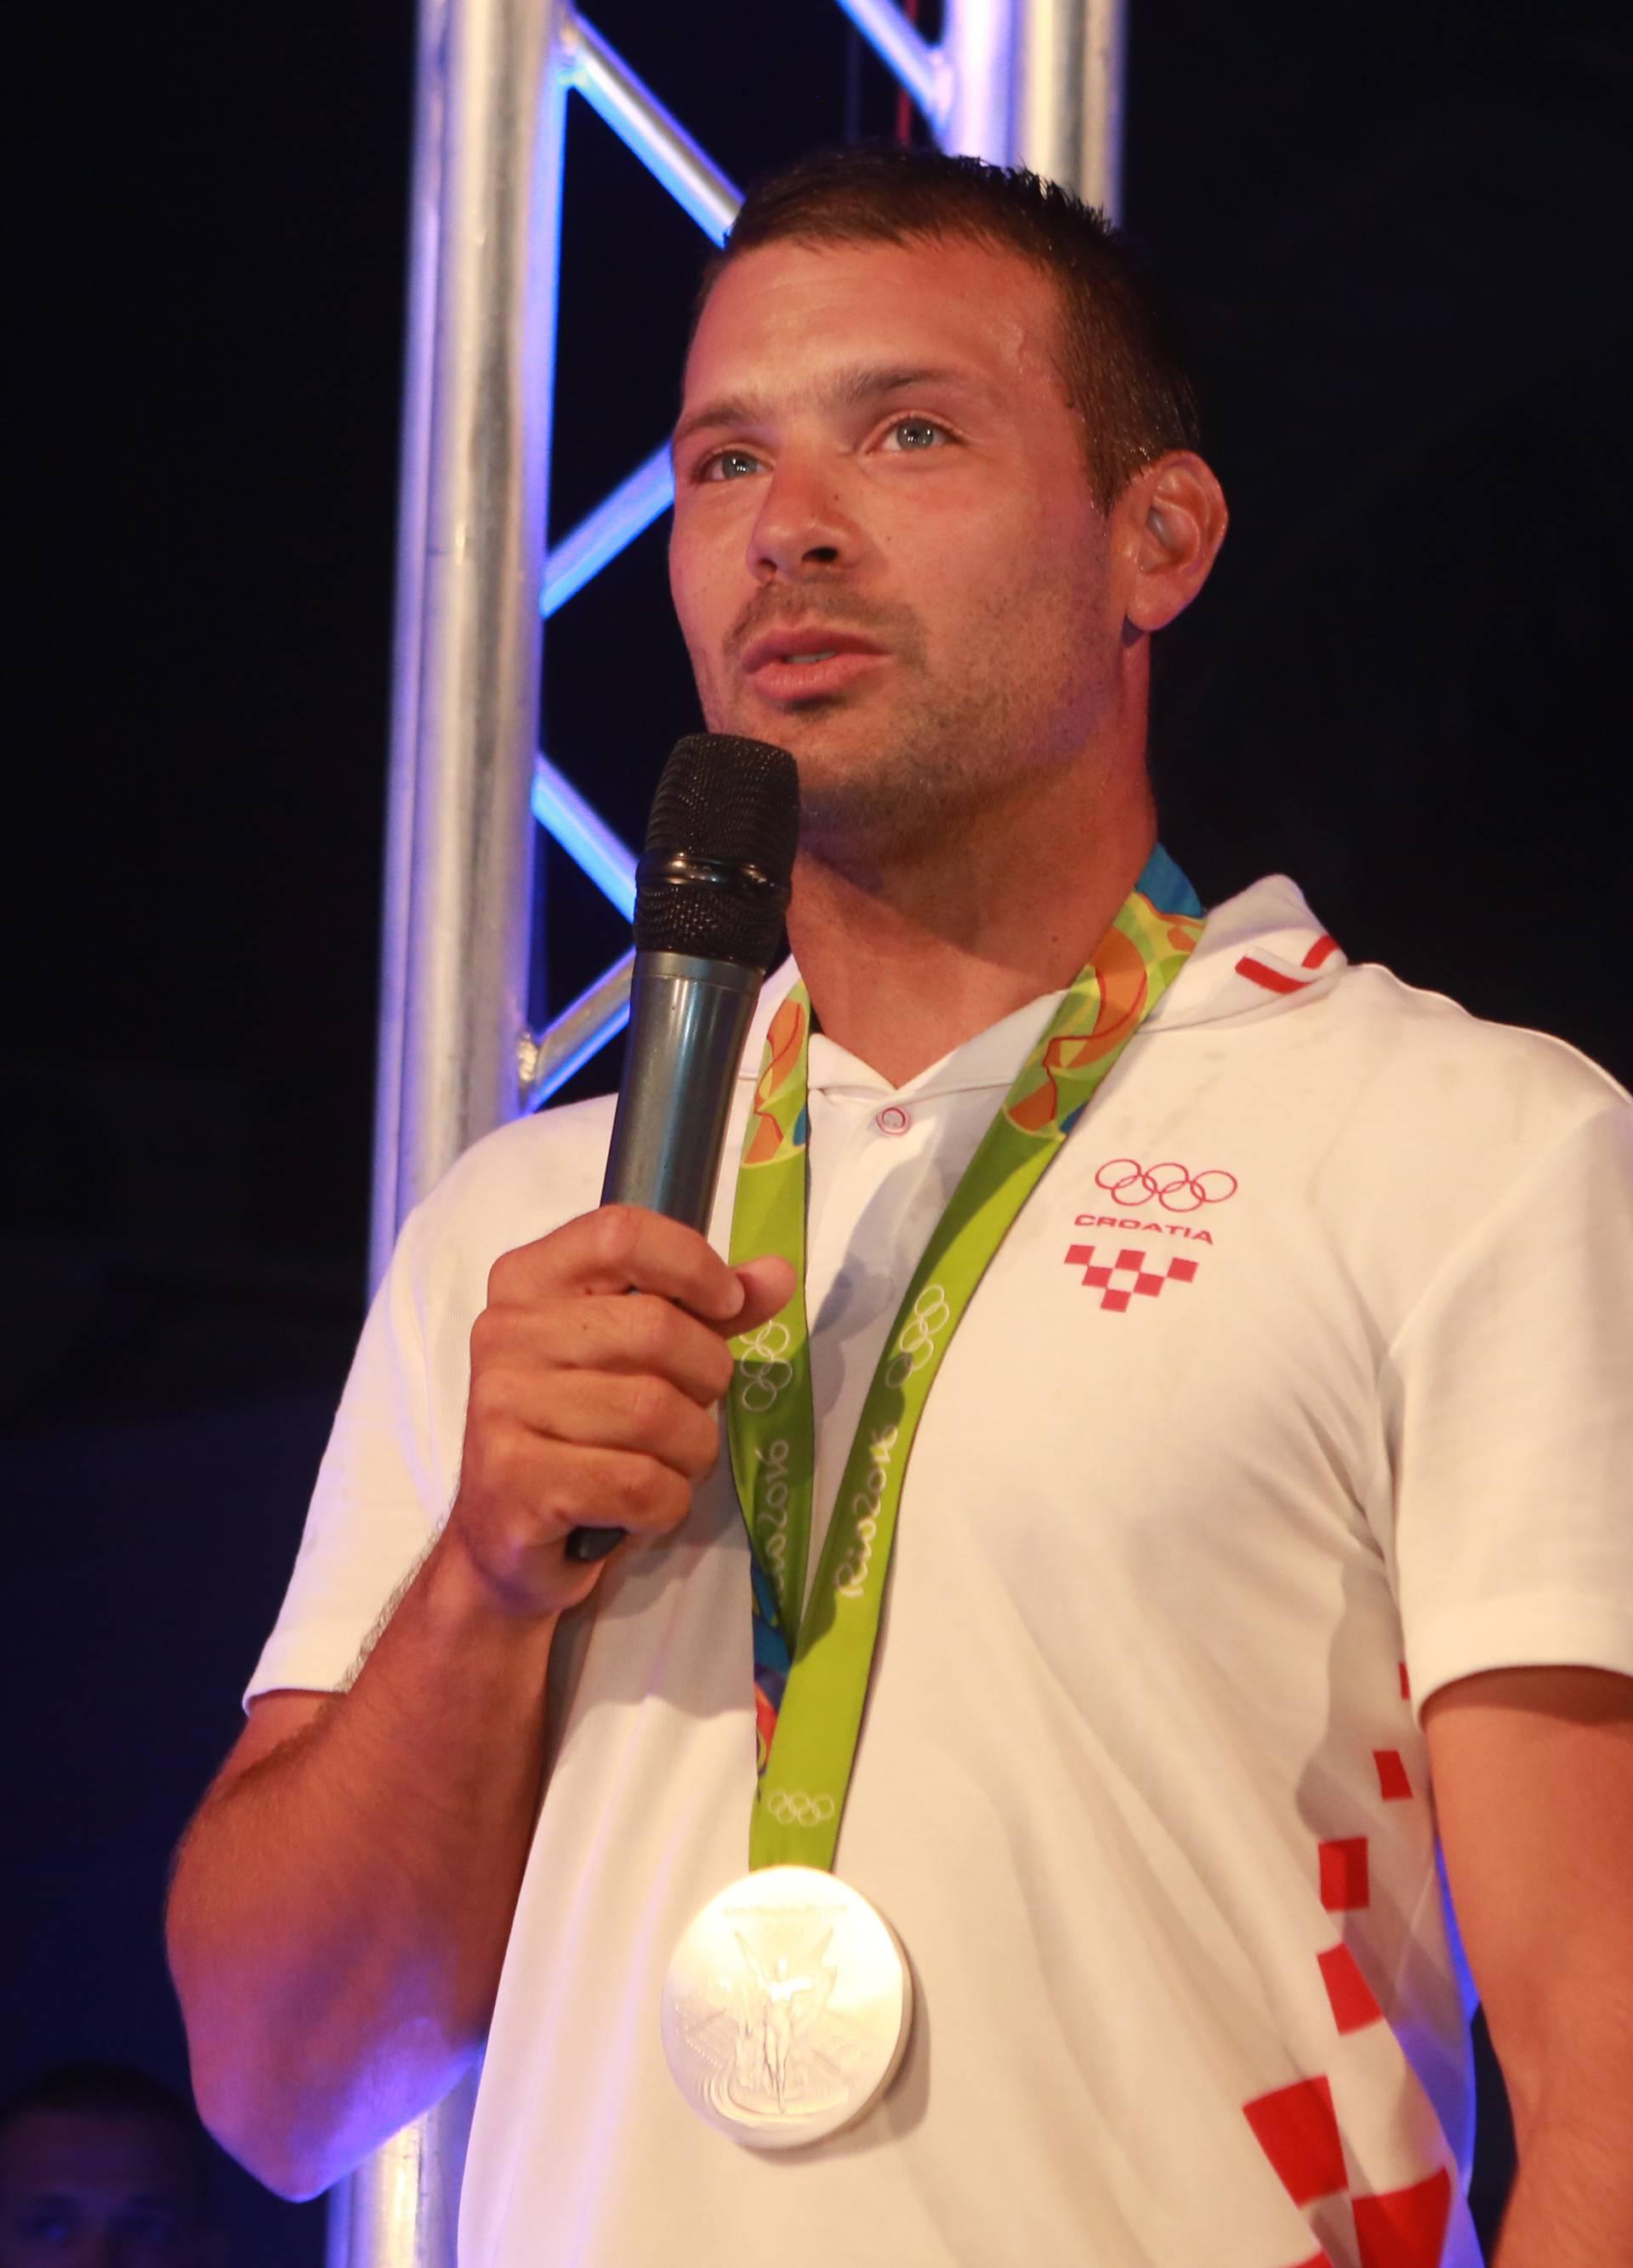 Tonci Stipanovic